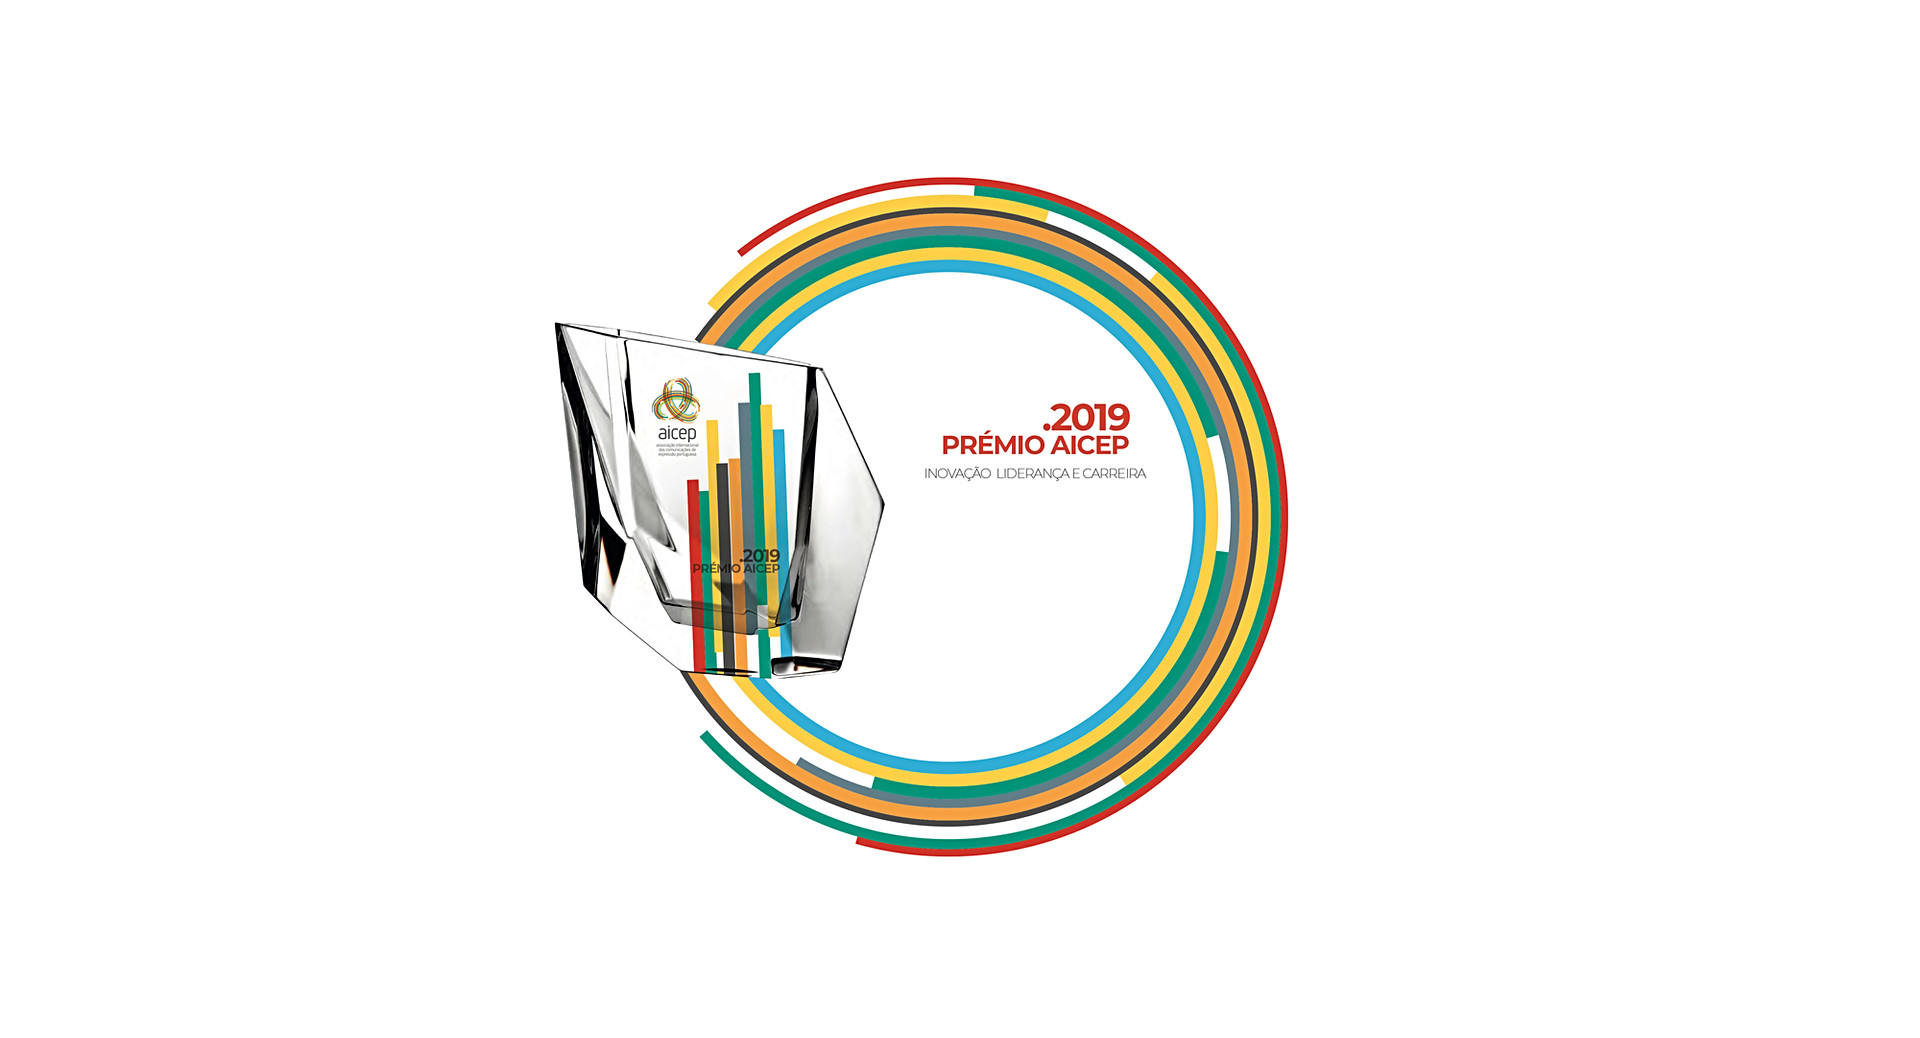 Branding - Design Prémio AICEP 2019